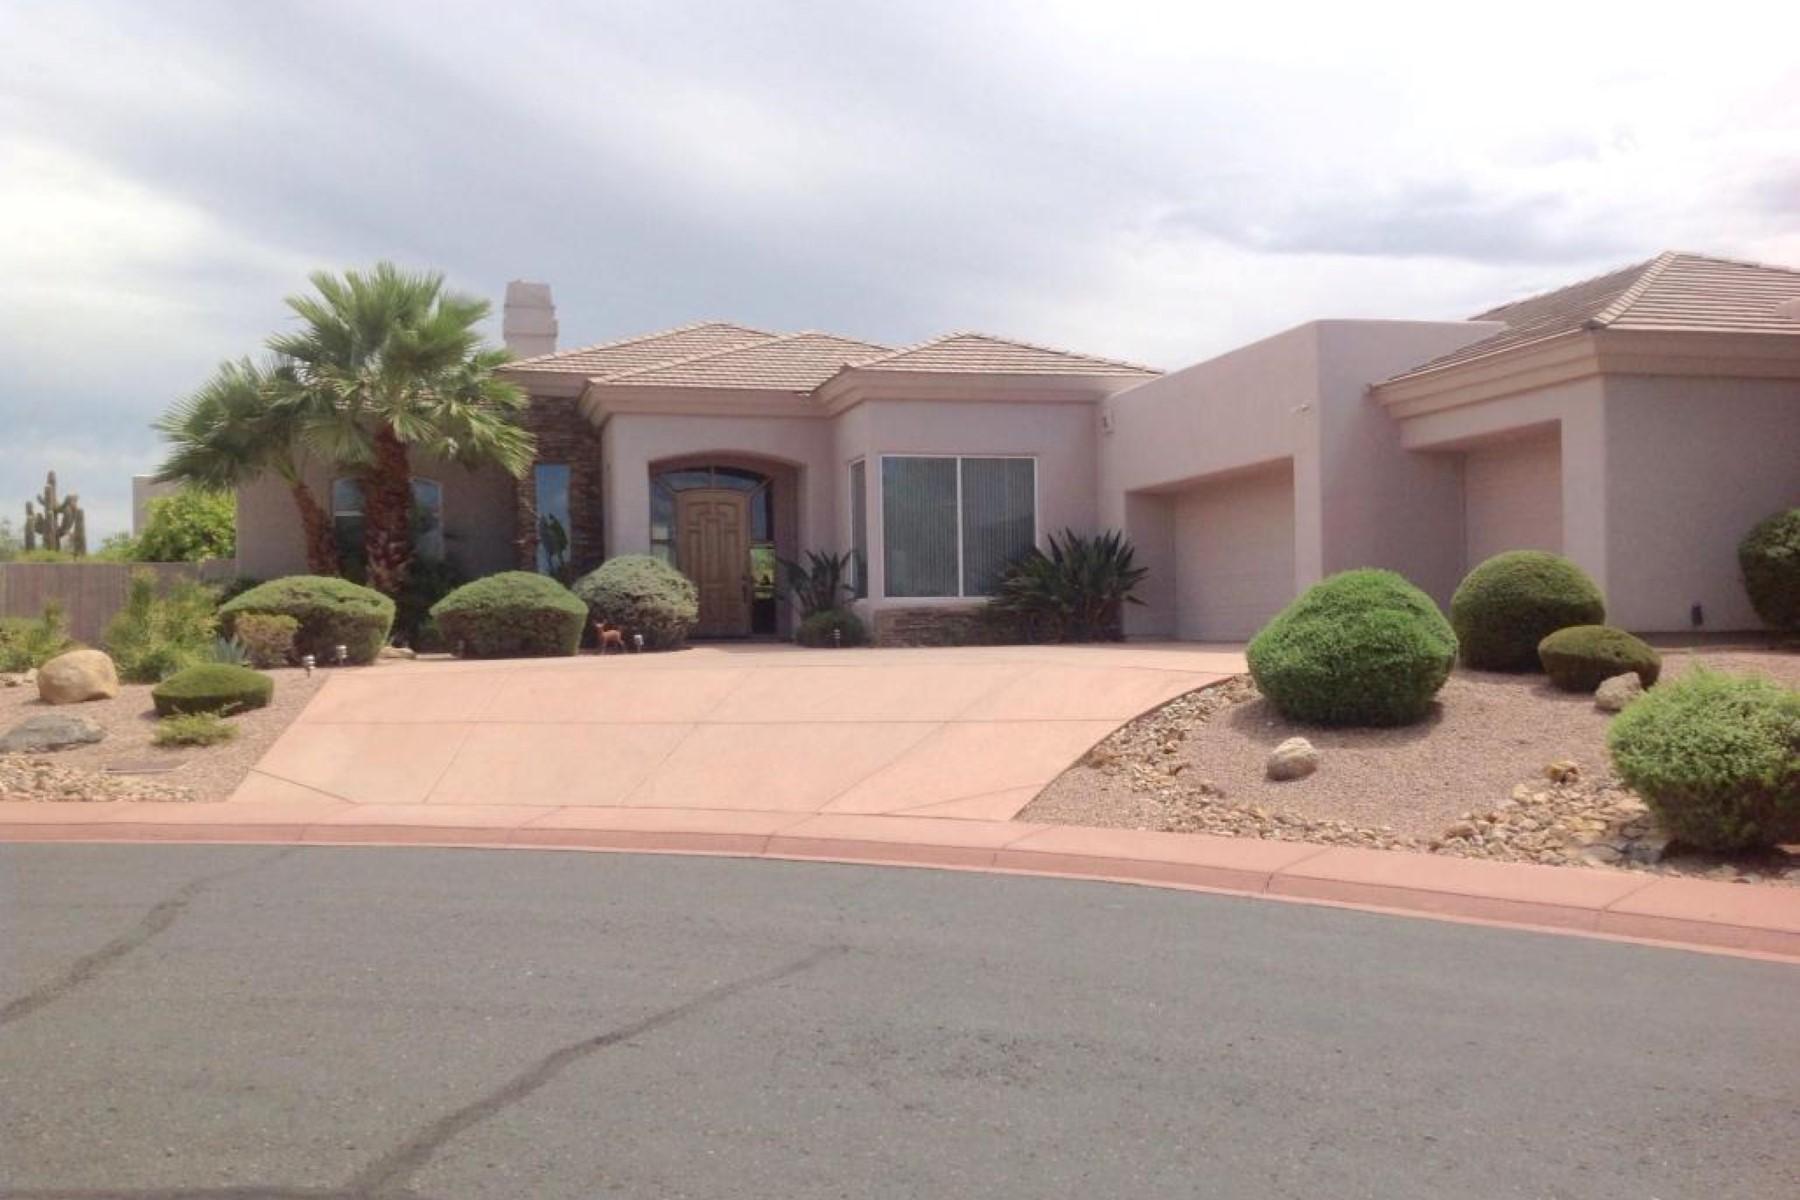 獨棟家庭住宅 為 出售 在 Absolutely gorgeous, custom designed home in Country Club Estates 4055 N Recker Rd 24 Mesa, 亞利桑那州 85215 美國